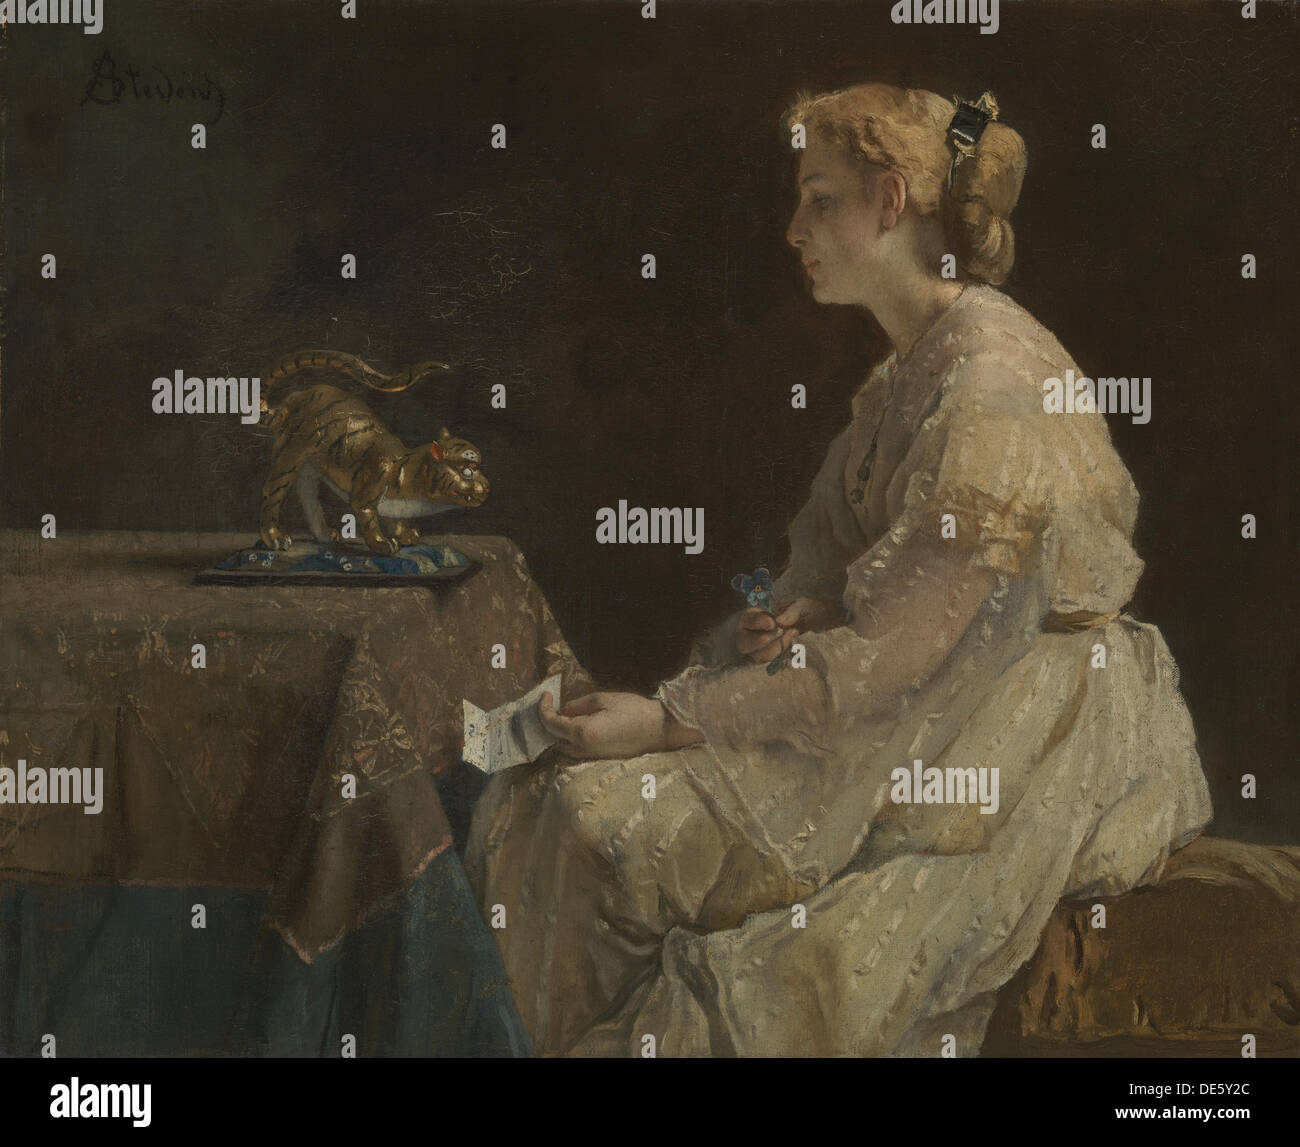 The Present, c. 1870. Artist: Stevens, Alfred (1823-1906) - Stock Image